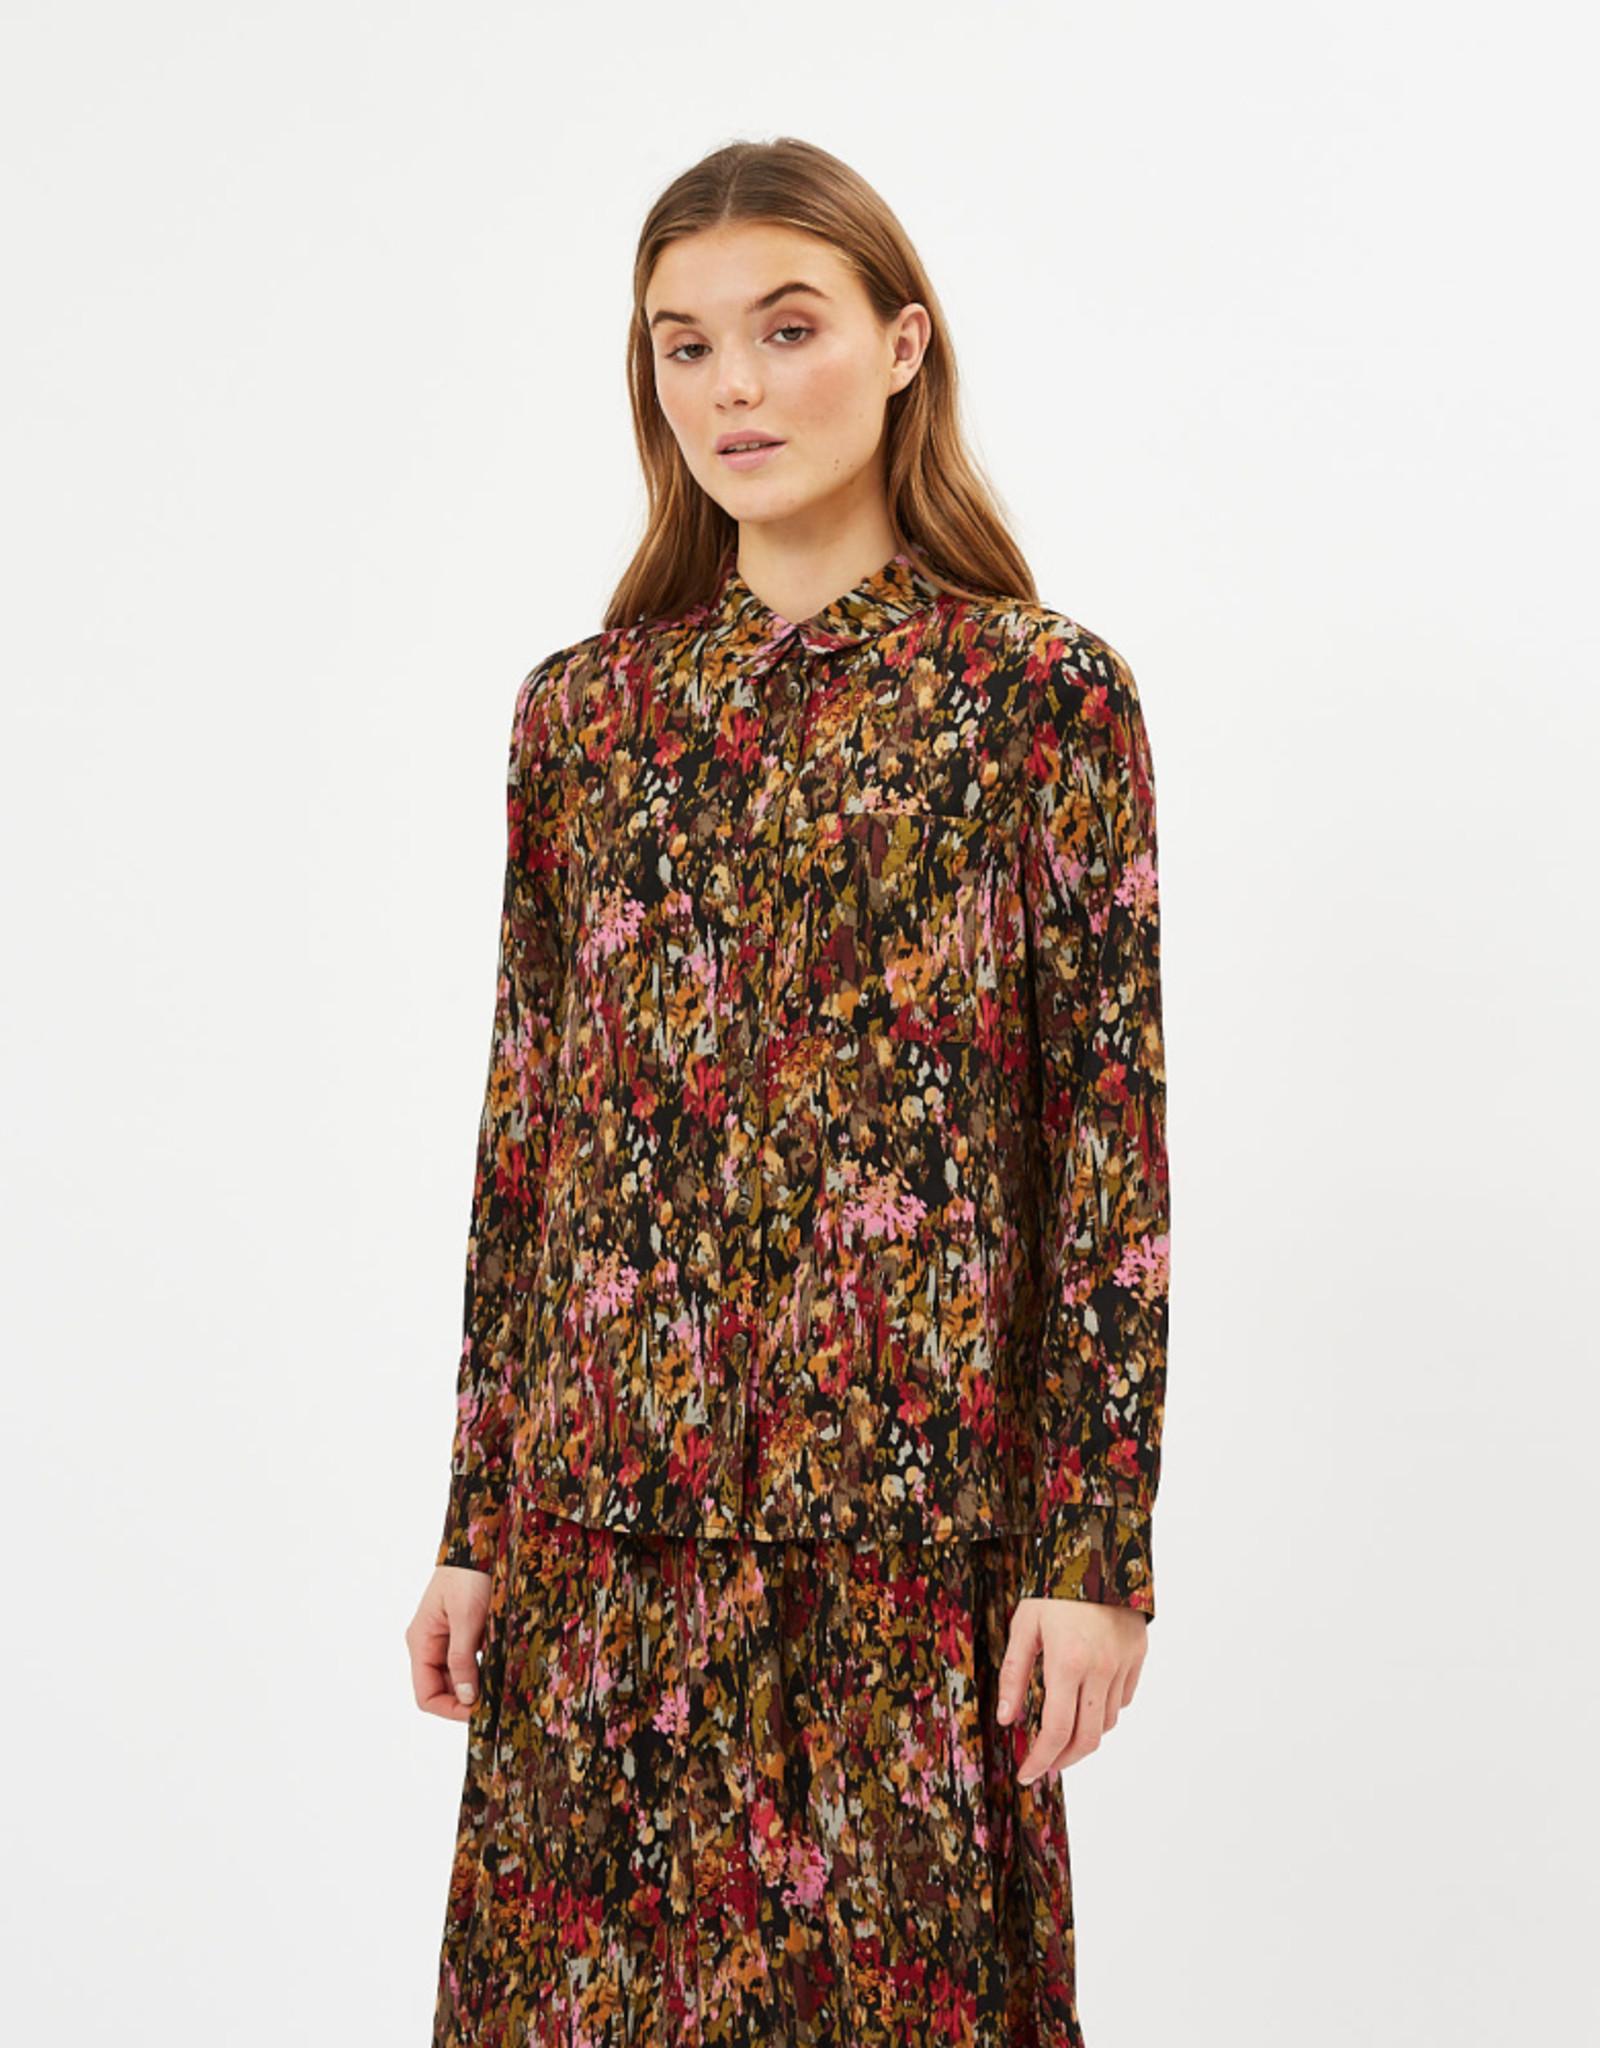 Minimum Kesia Long Sleeved Shirt Black